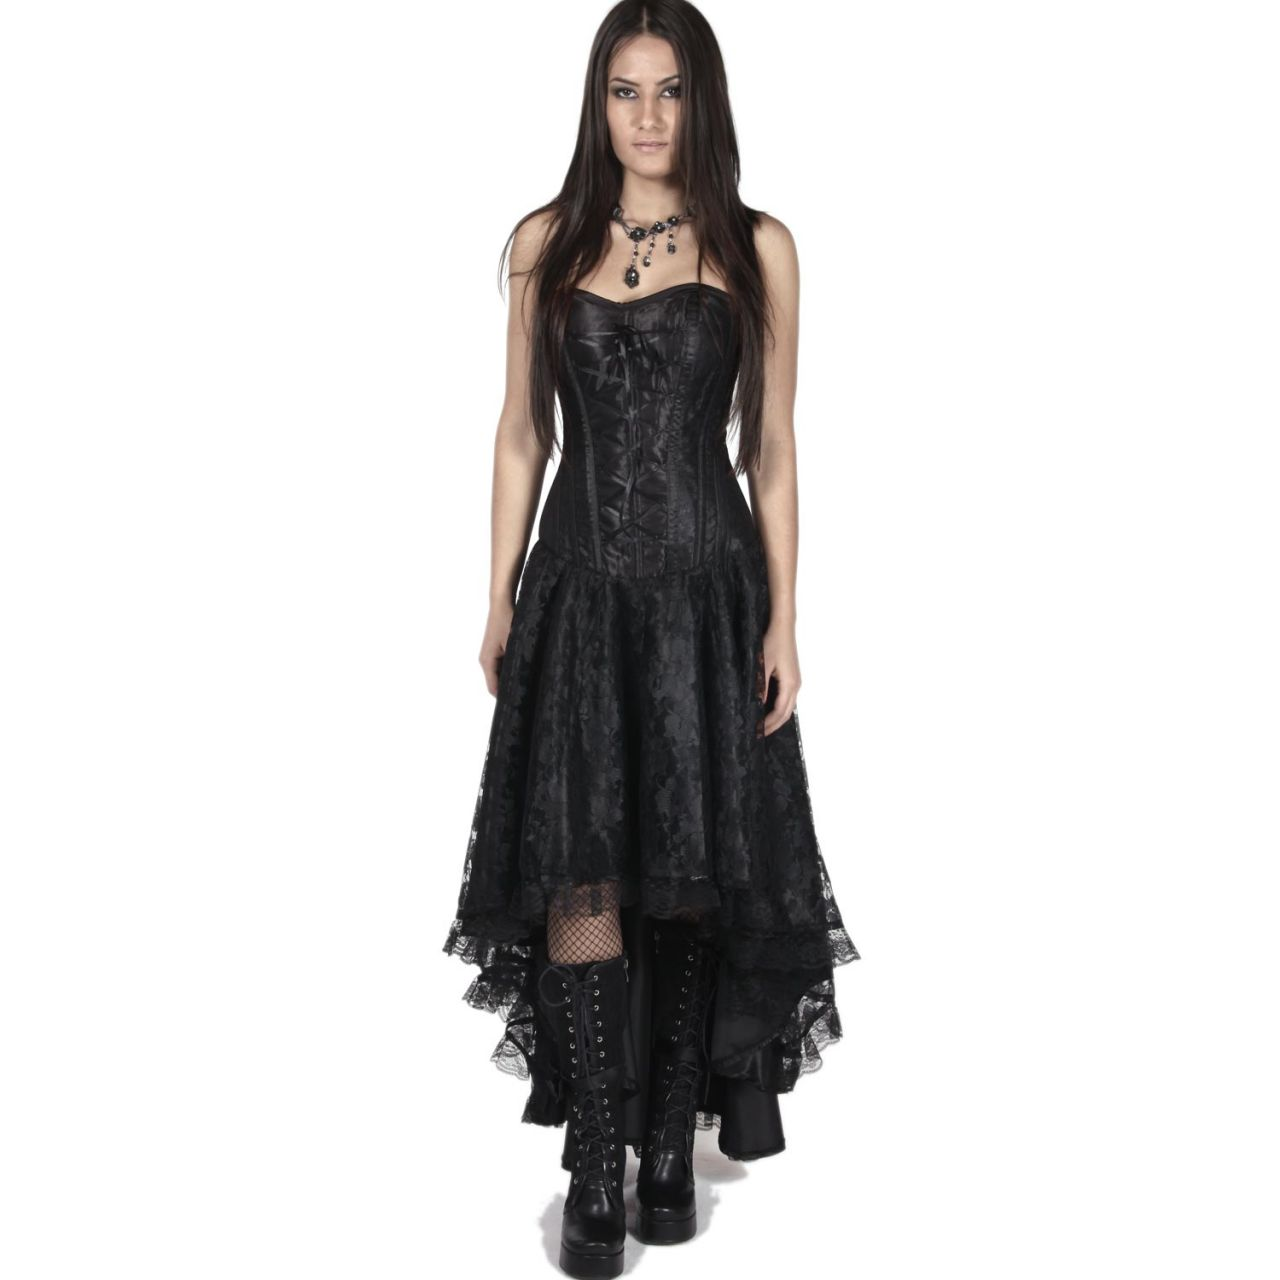 Langes schwarzes Kleid mit Corsage - Mollflander Dress  VOODOOMANIACS